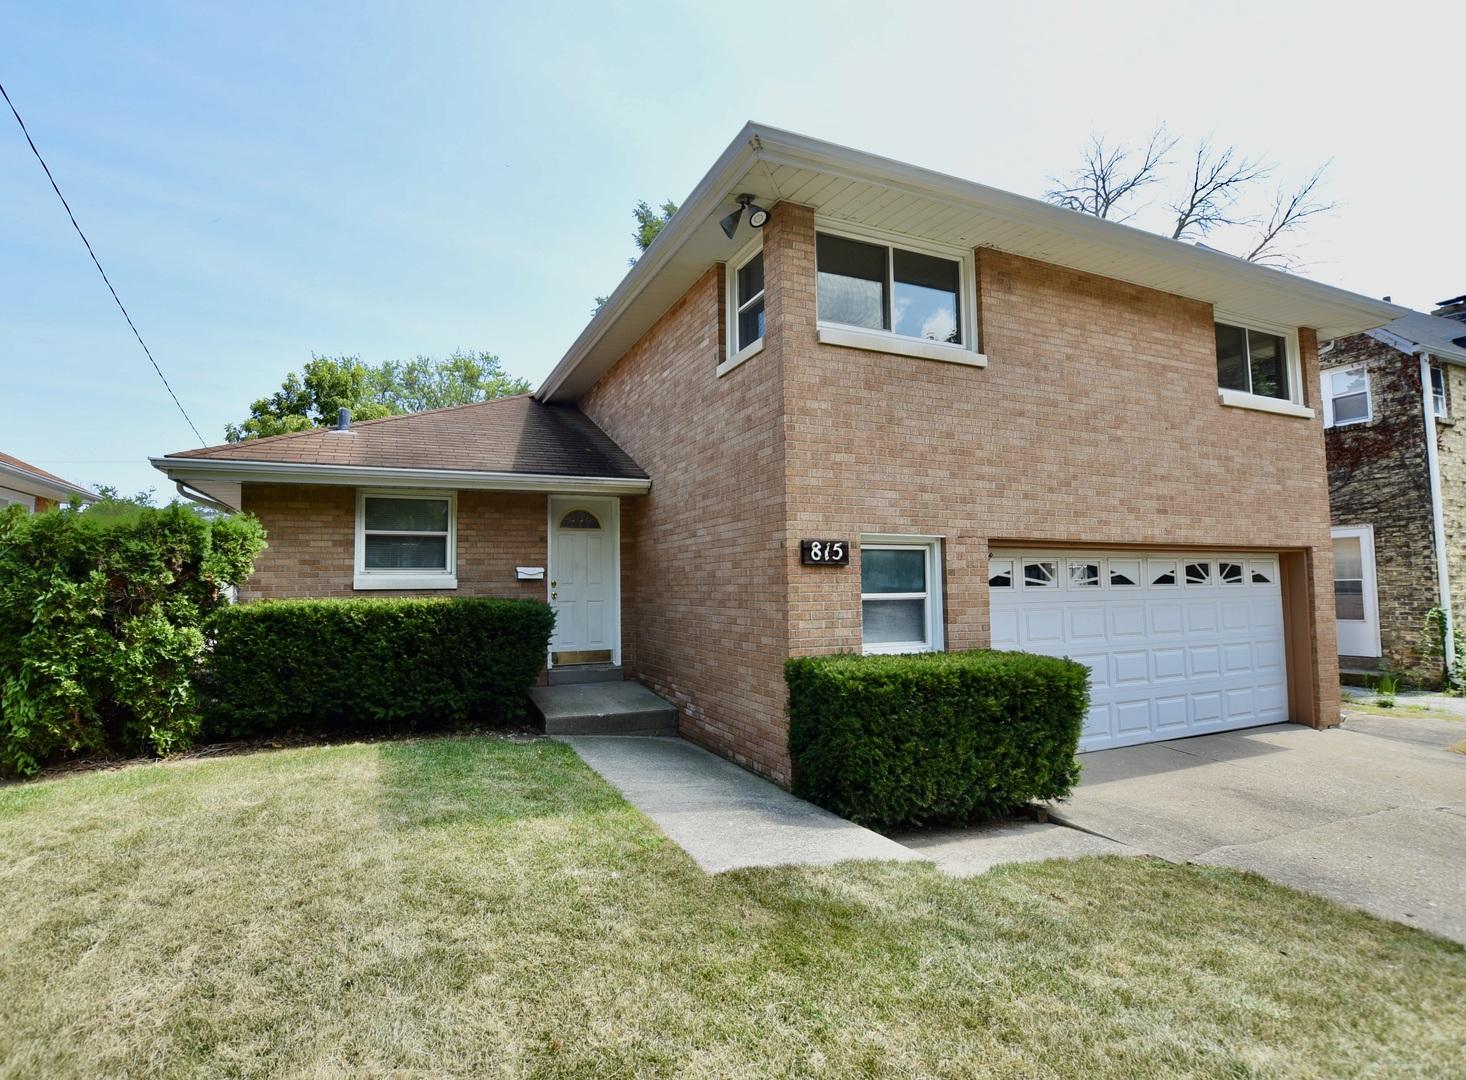 815 Glenwood Avenue, Waukegan IL 60087